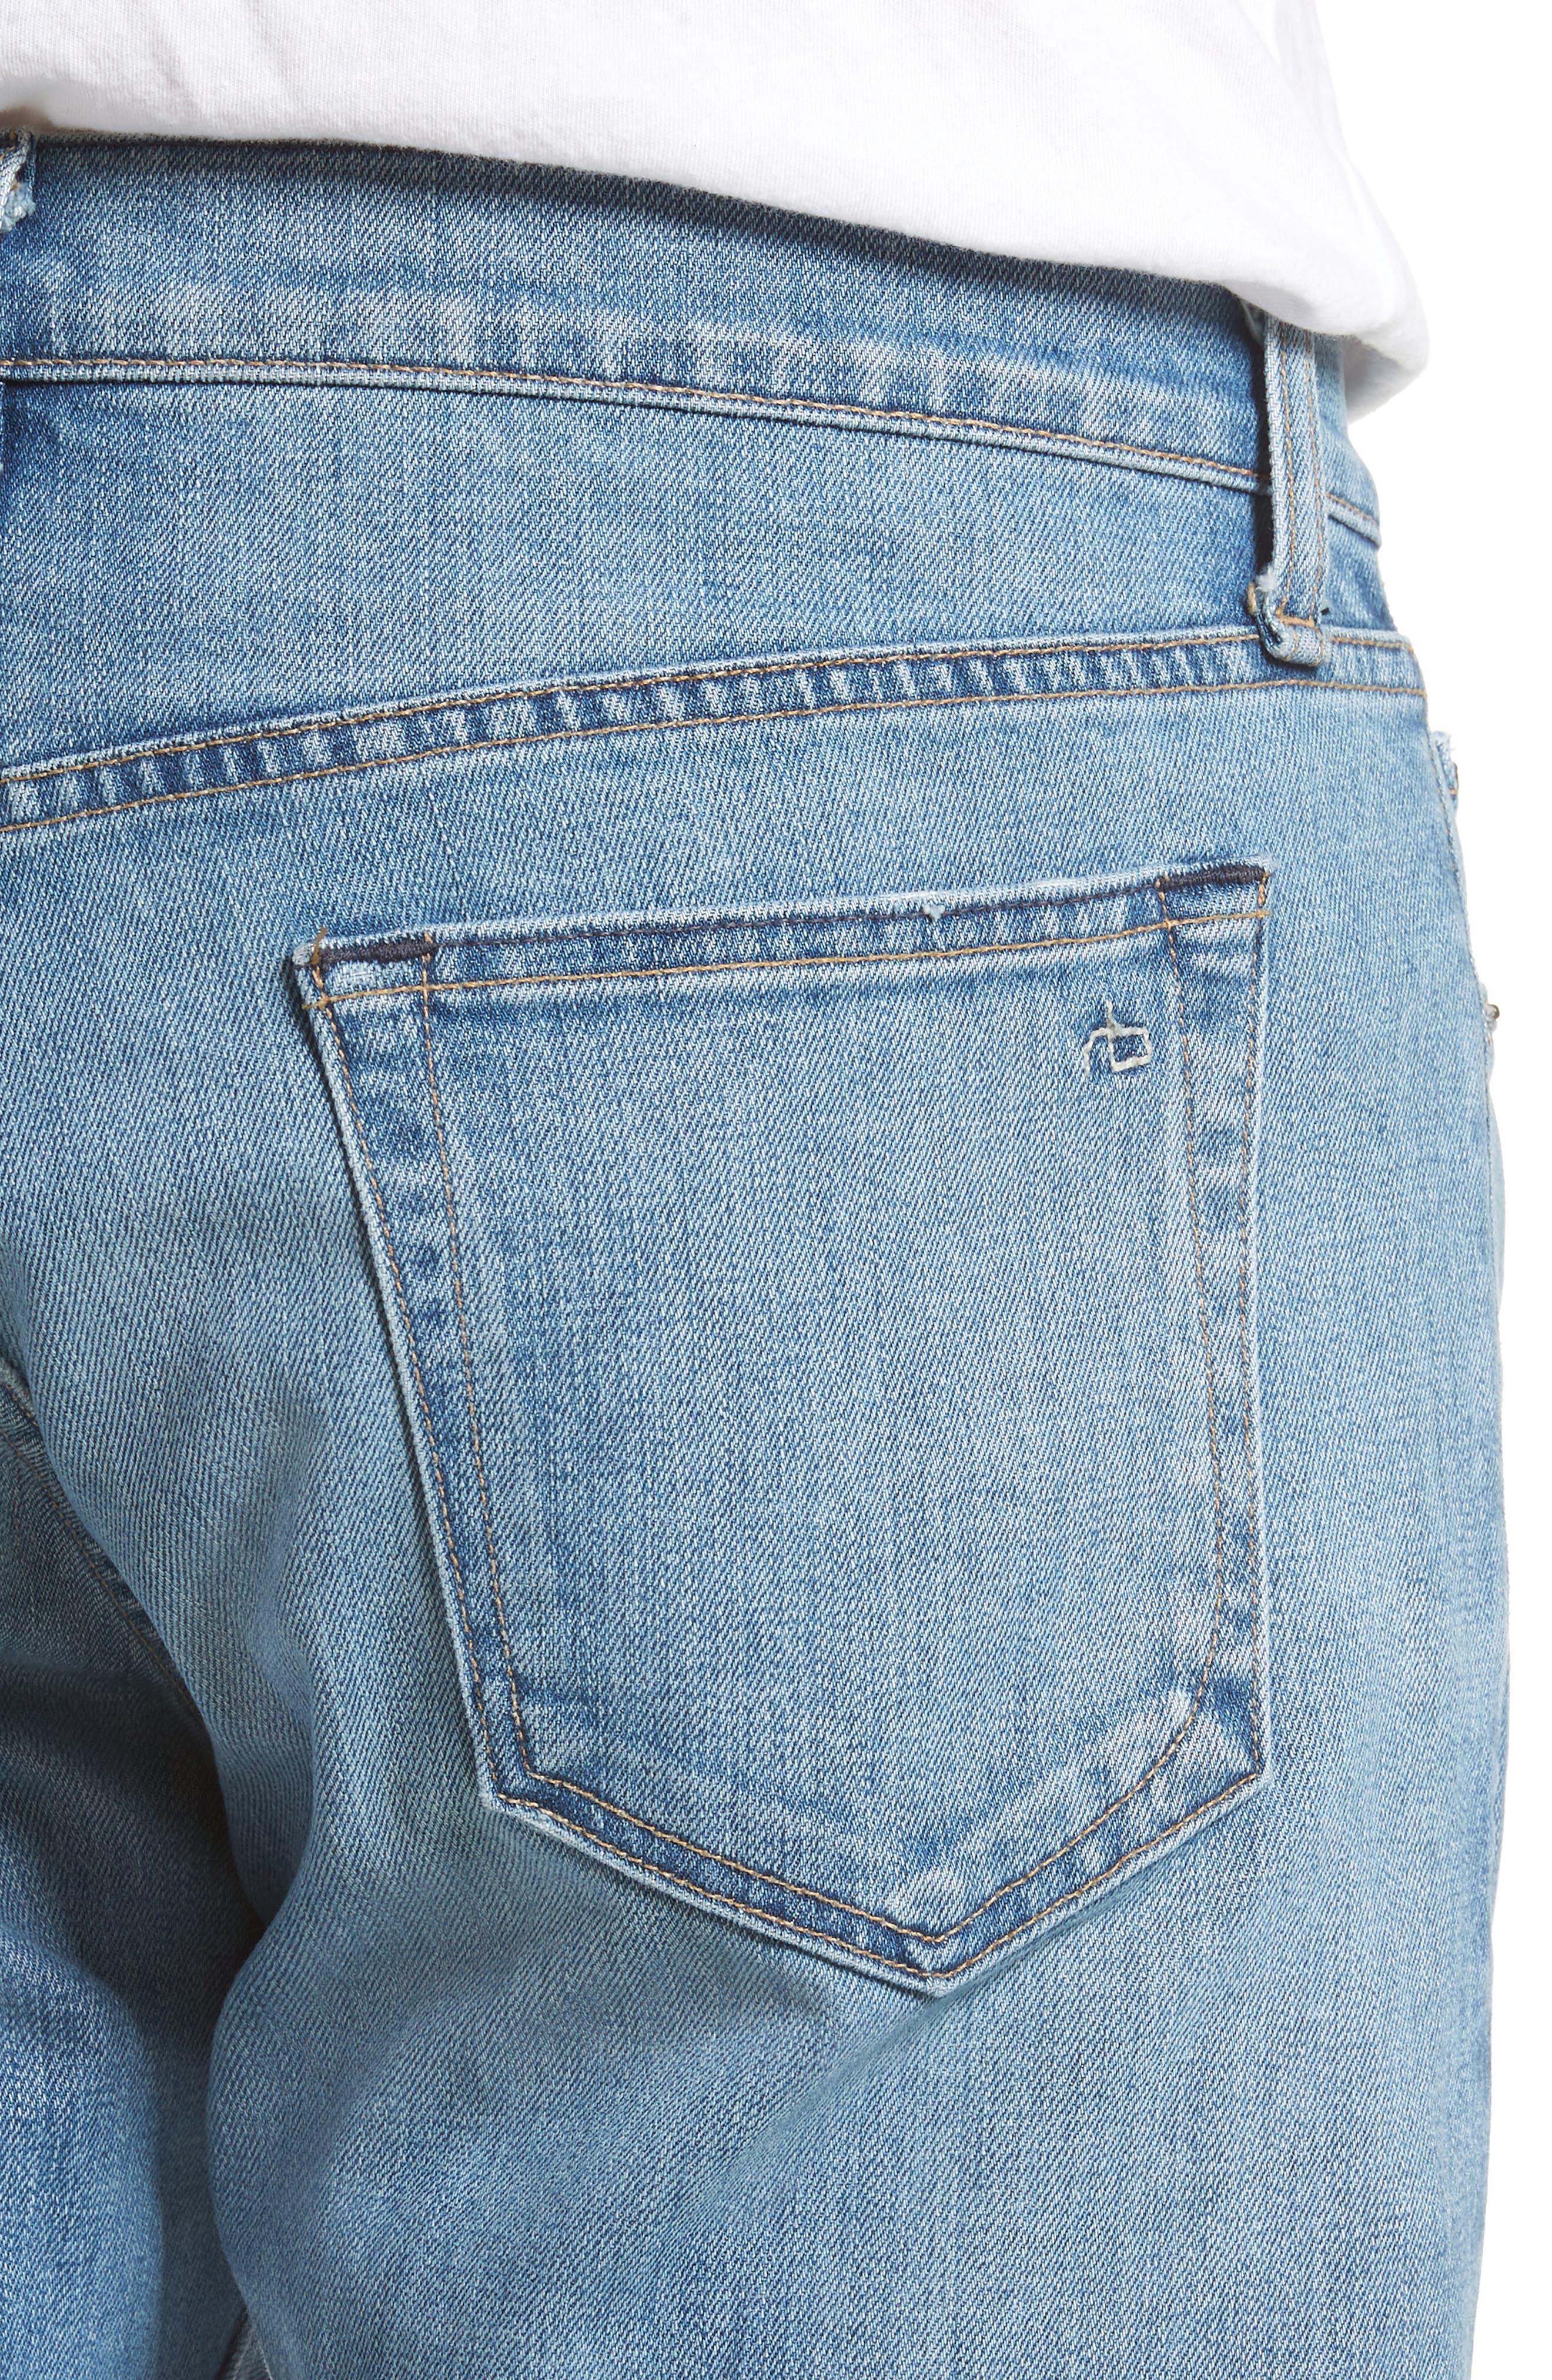 Fit 2 Slim Fit Jeans,                             Alternate thumbnail 4, color,                             PYLLE